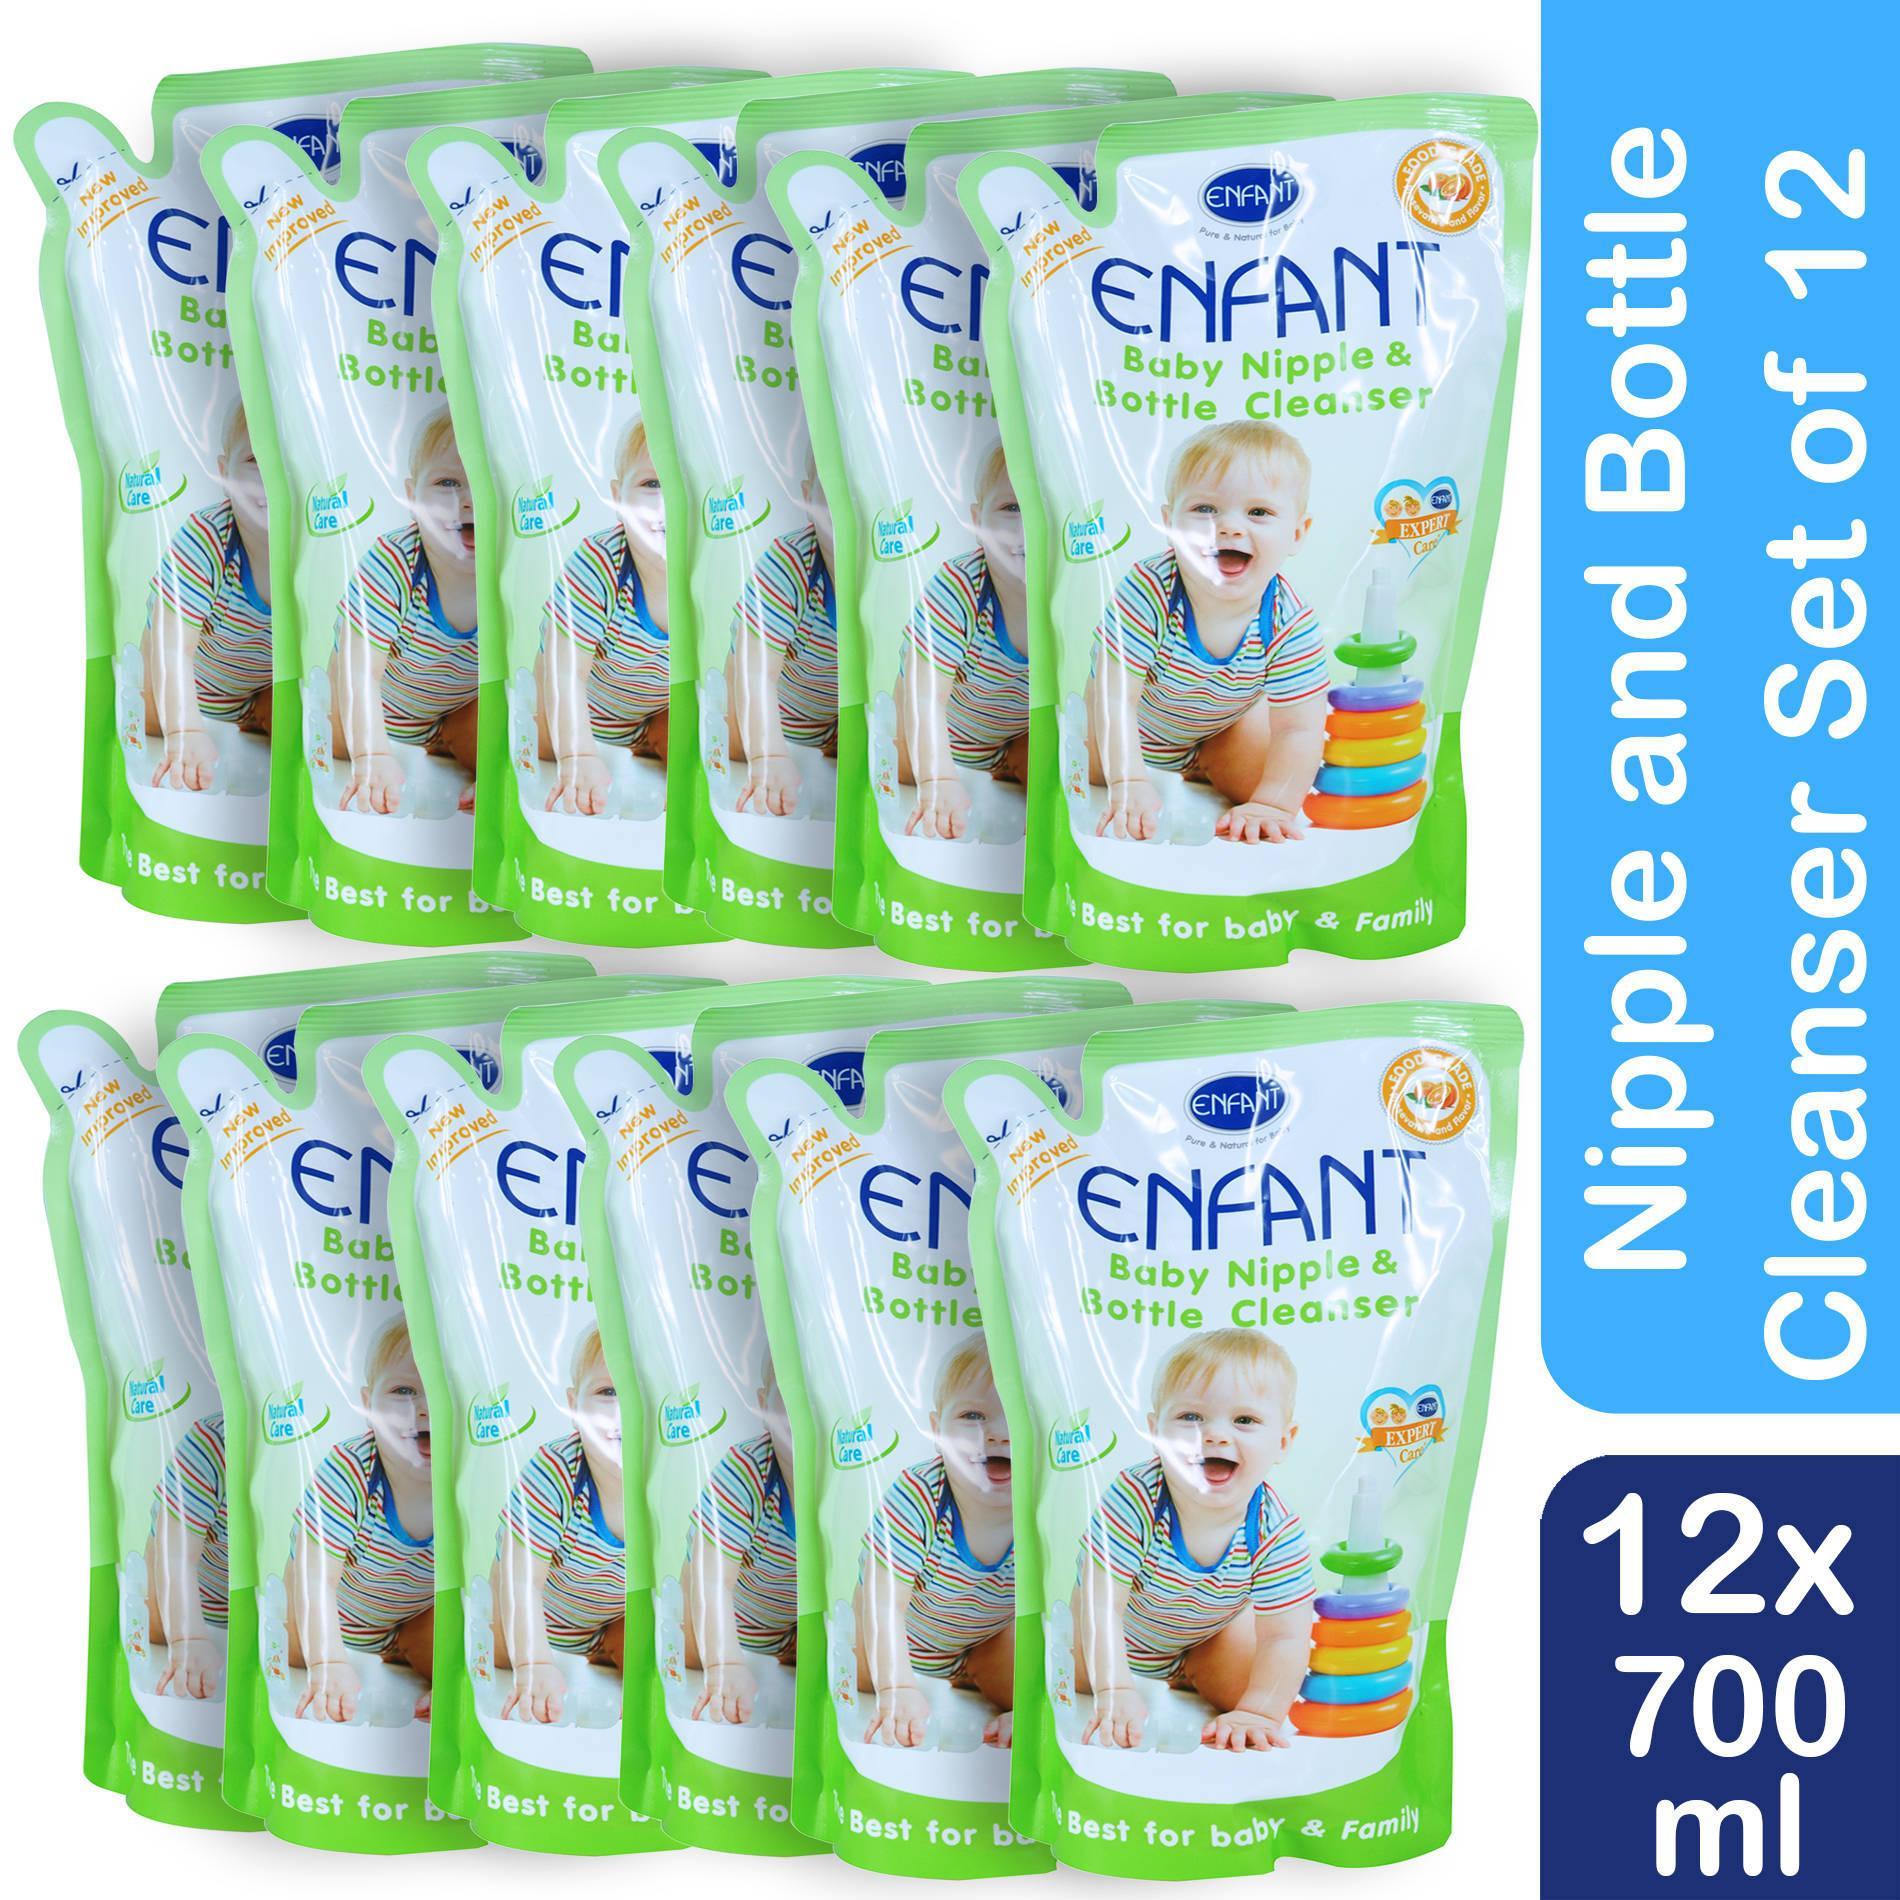 Enfant Nipple and Bottle Liquid Cleanser 700 ml Pack of 12 - thumbnail